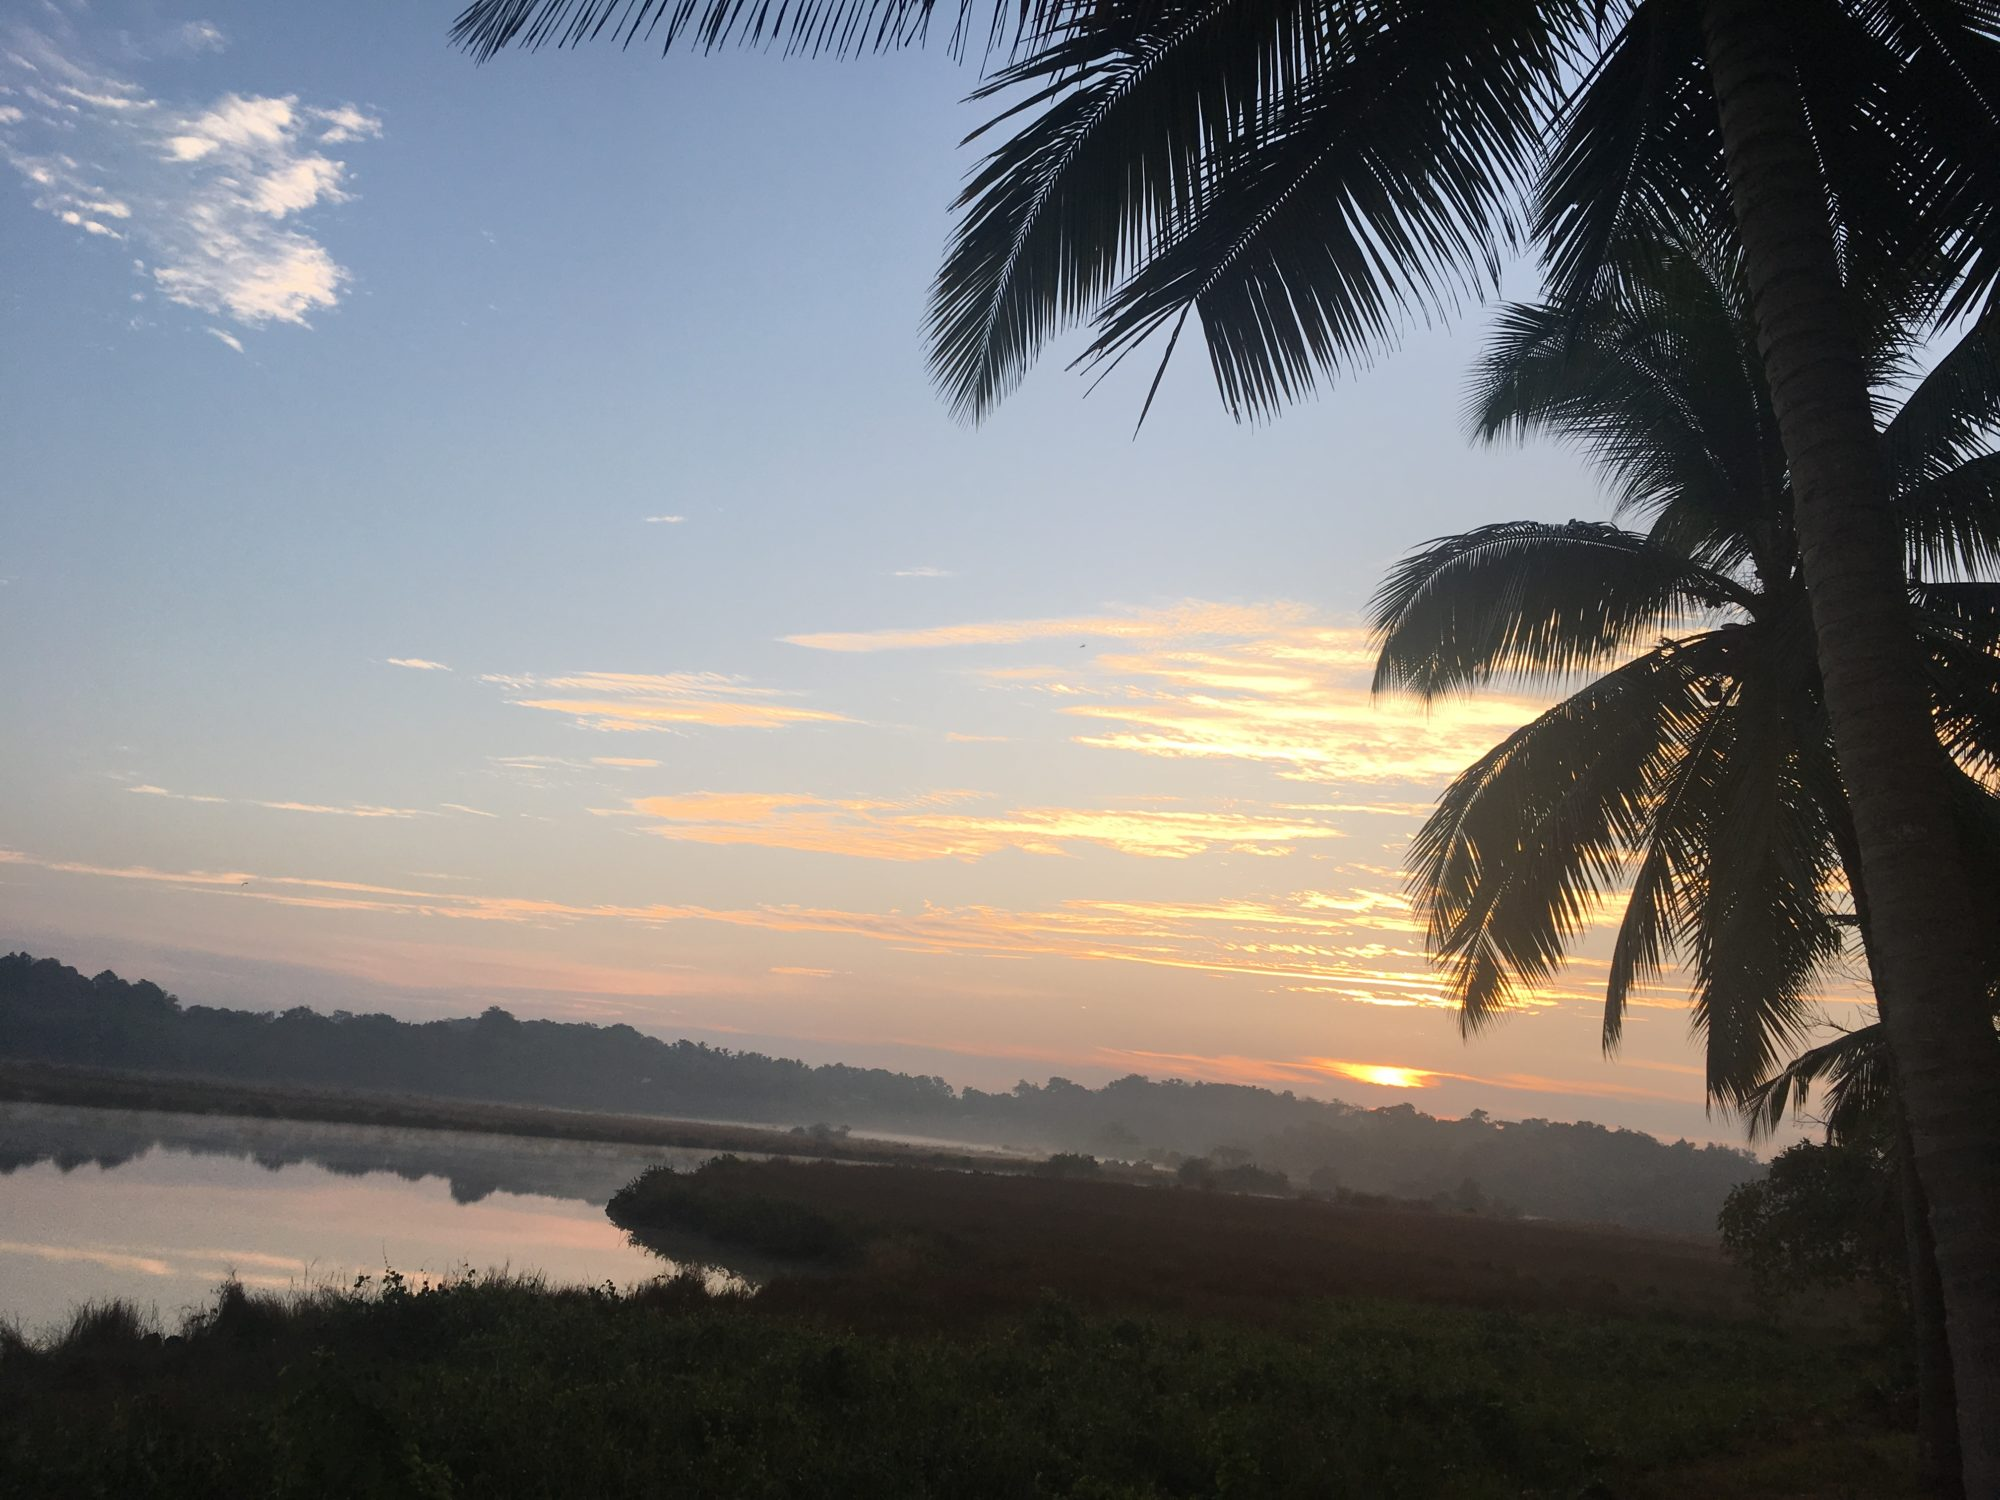 wanderlust-wednesday-dreamy-december-in-olaulim-backyards-sunrise